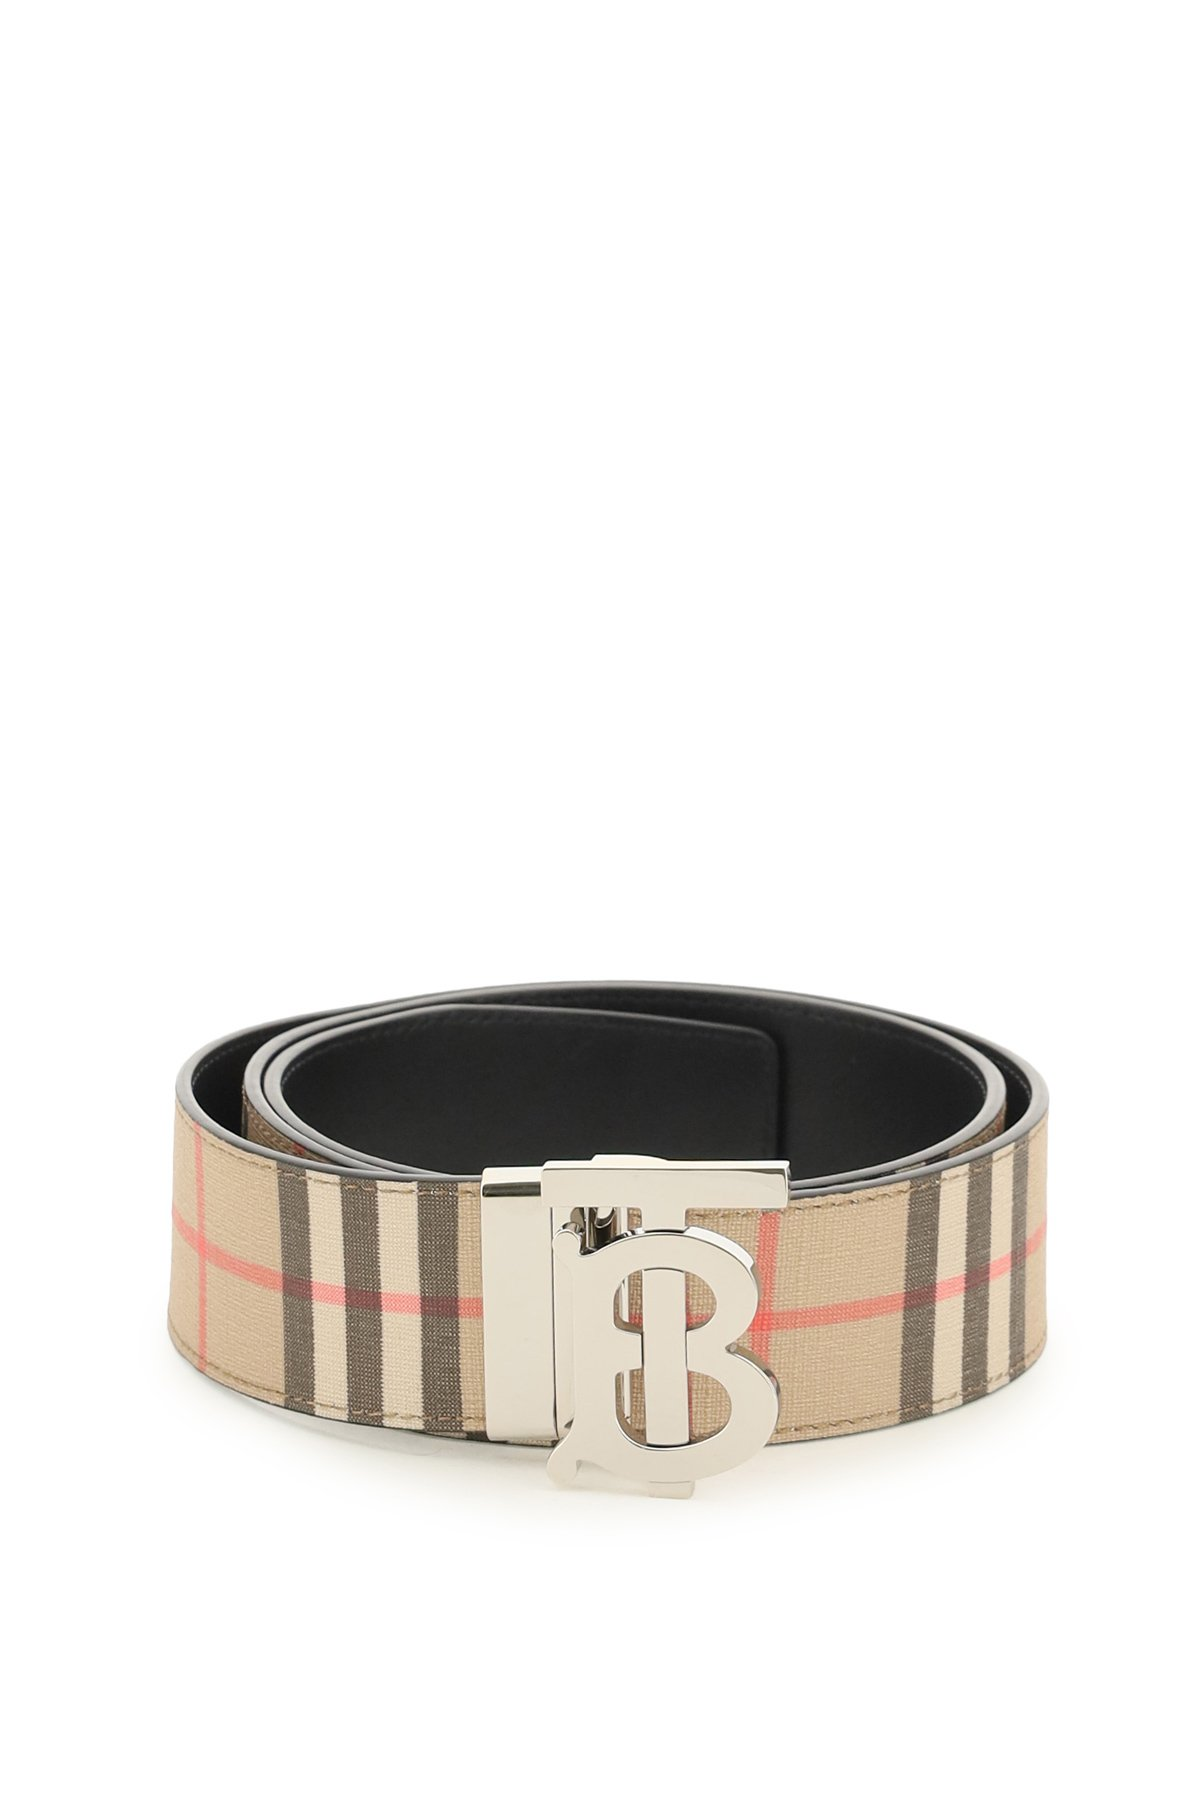 Burberry cintura tb buckle